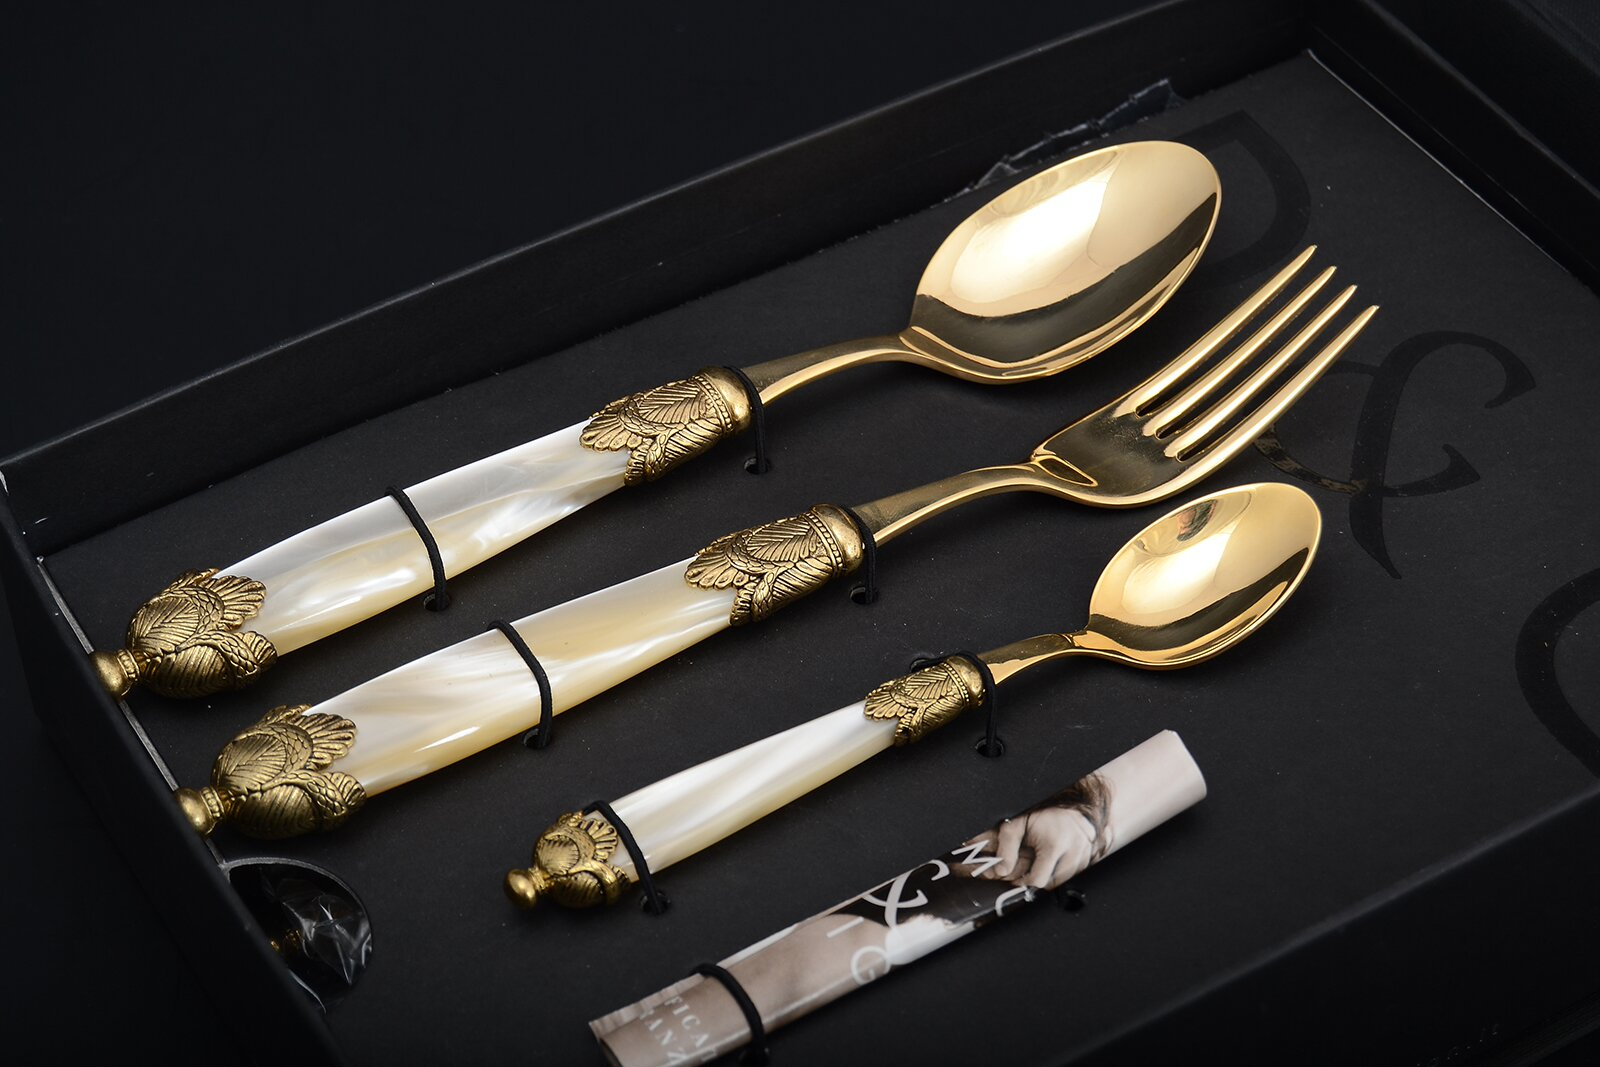 Набор столовых приборов SIENA ANTIQUE GOLD CHAMPAGNE GOLD от Domus